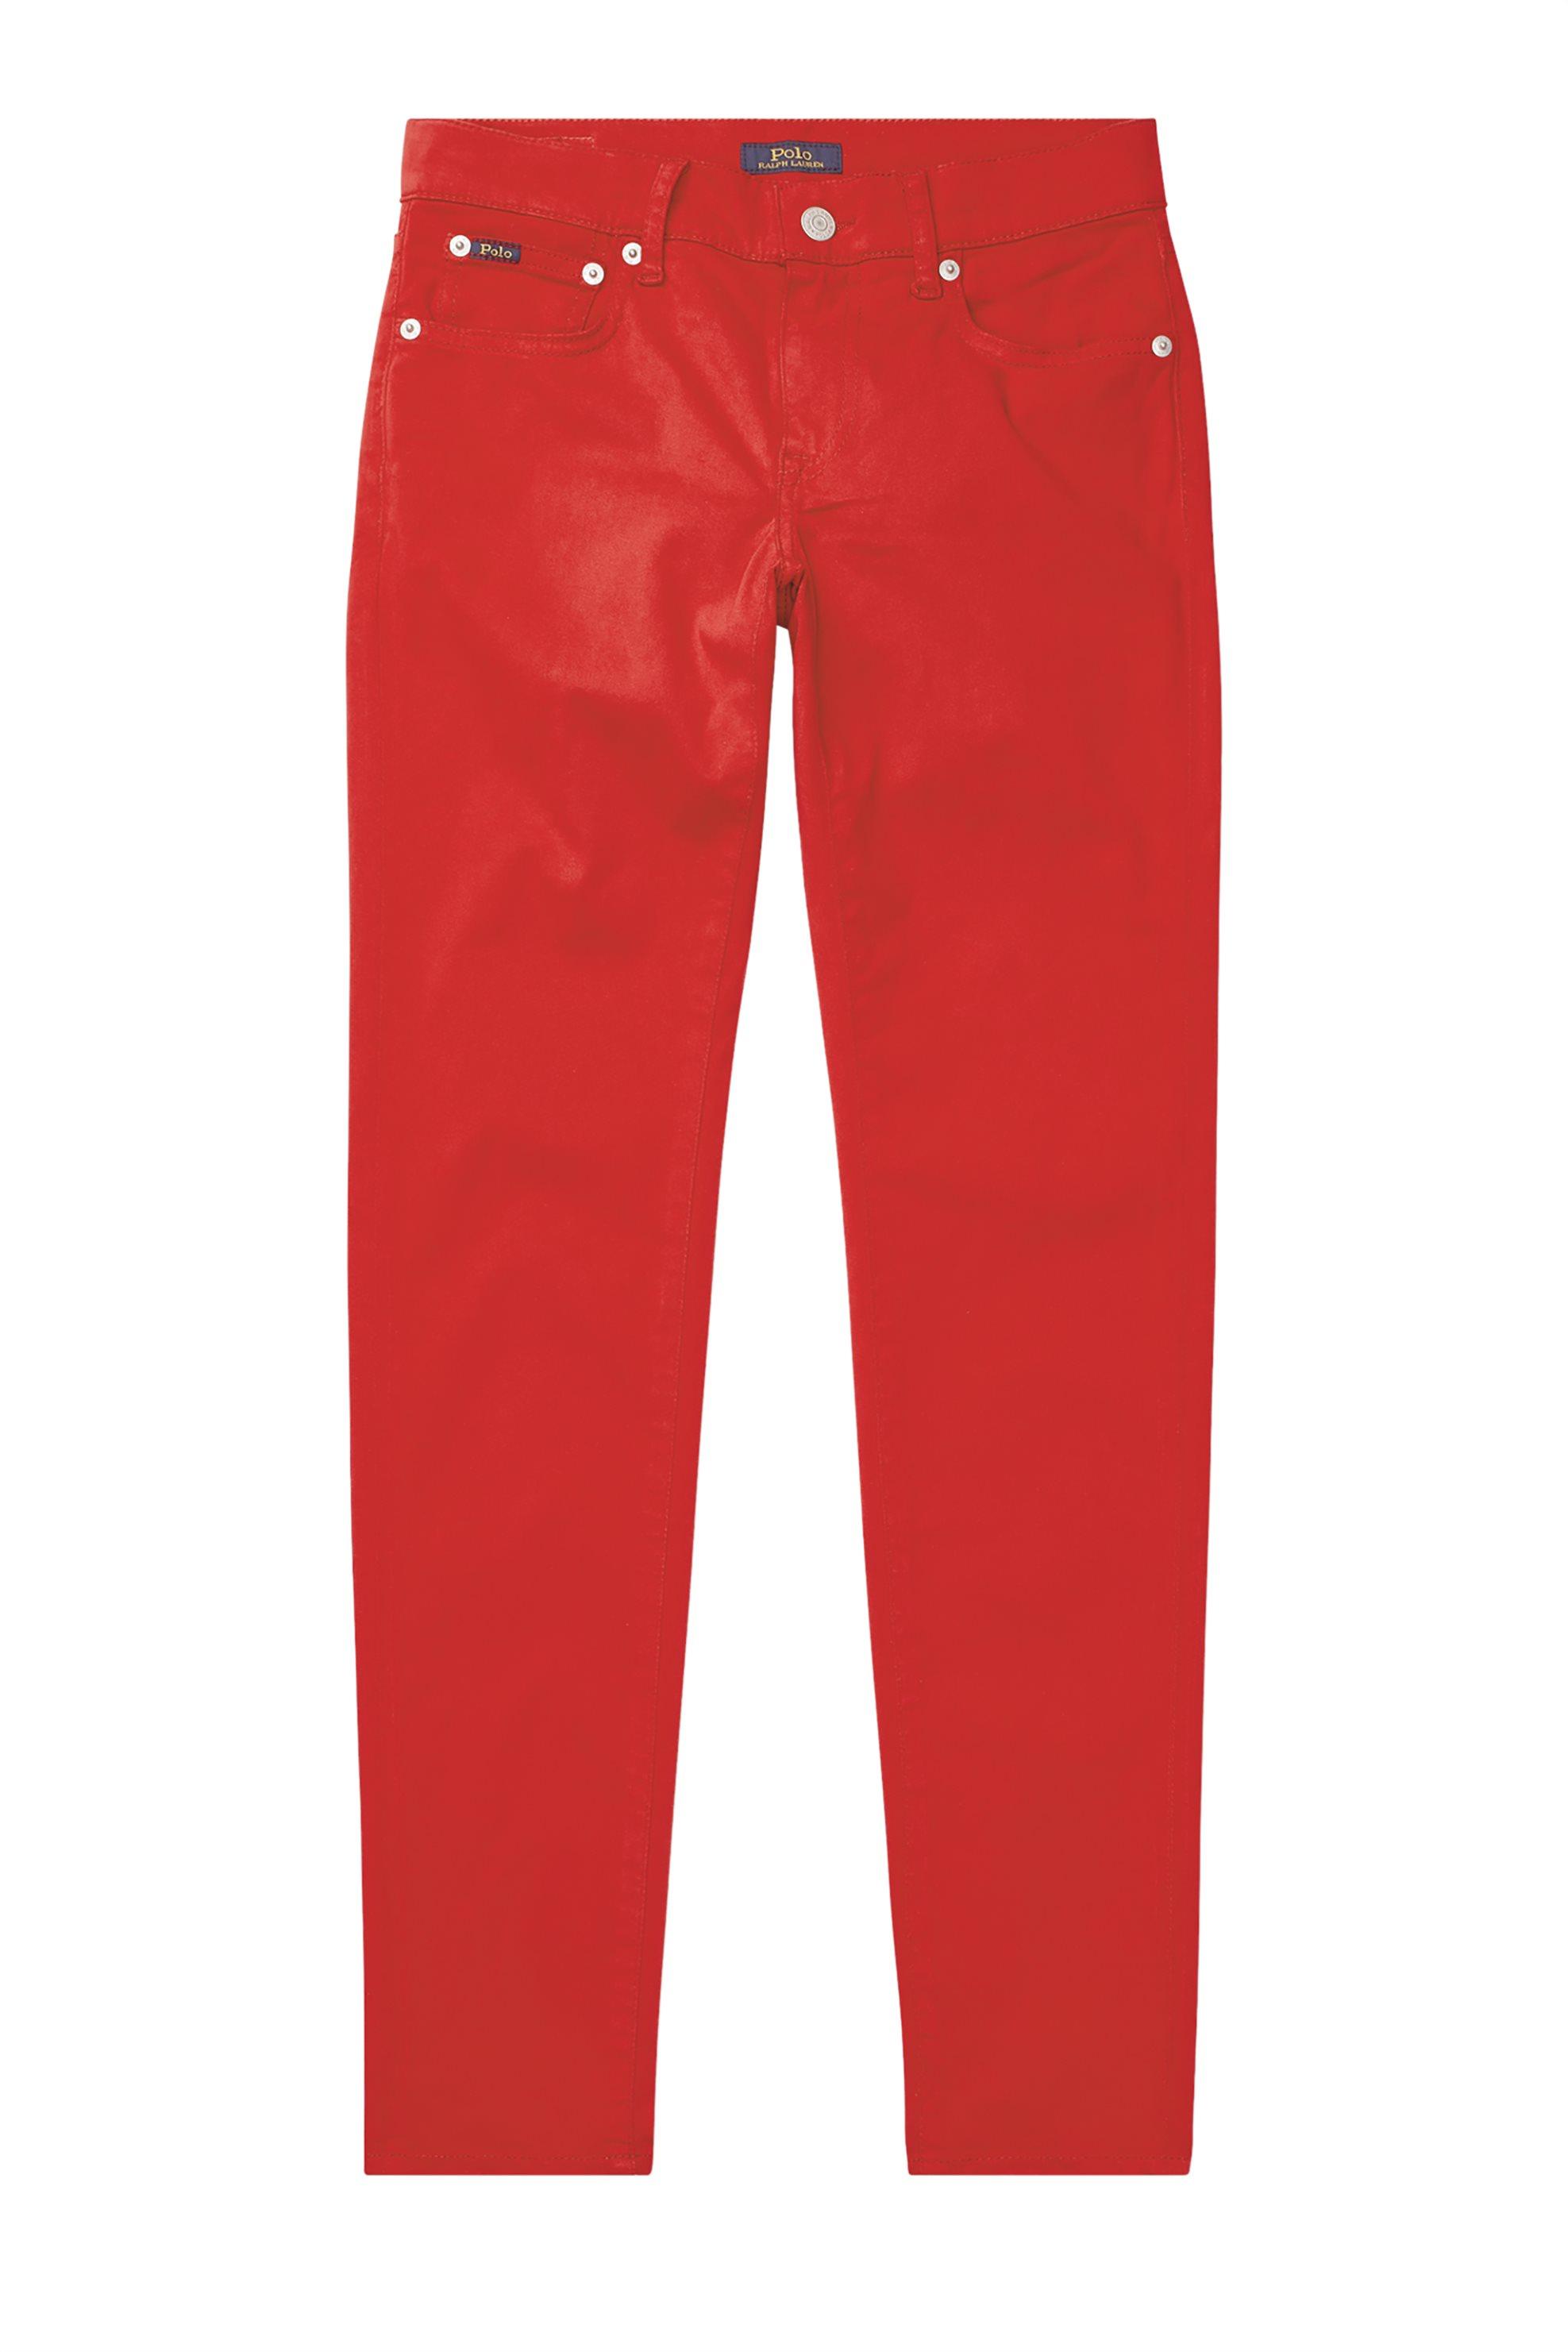 Polo Ralph Lauren γυναικείο παντελόνι Tompkins Sateen - 211671415014 - Κόκκινο γυναικα   ρουχα   παντελόνια   slim